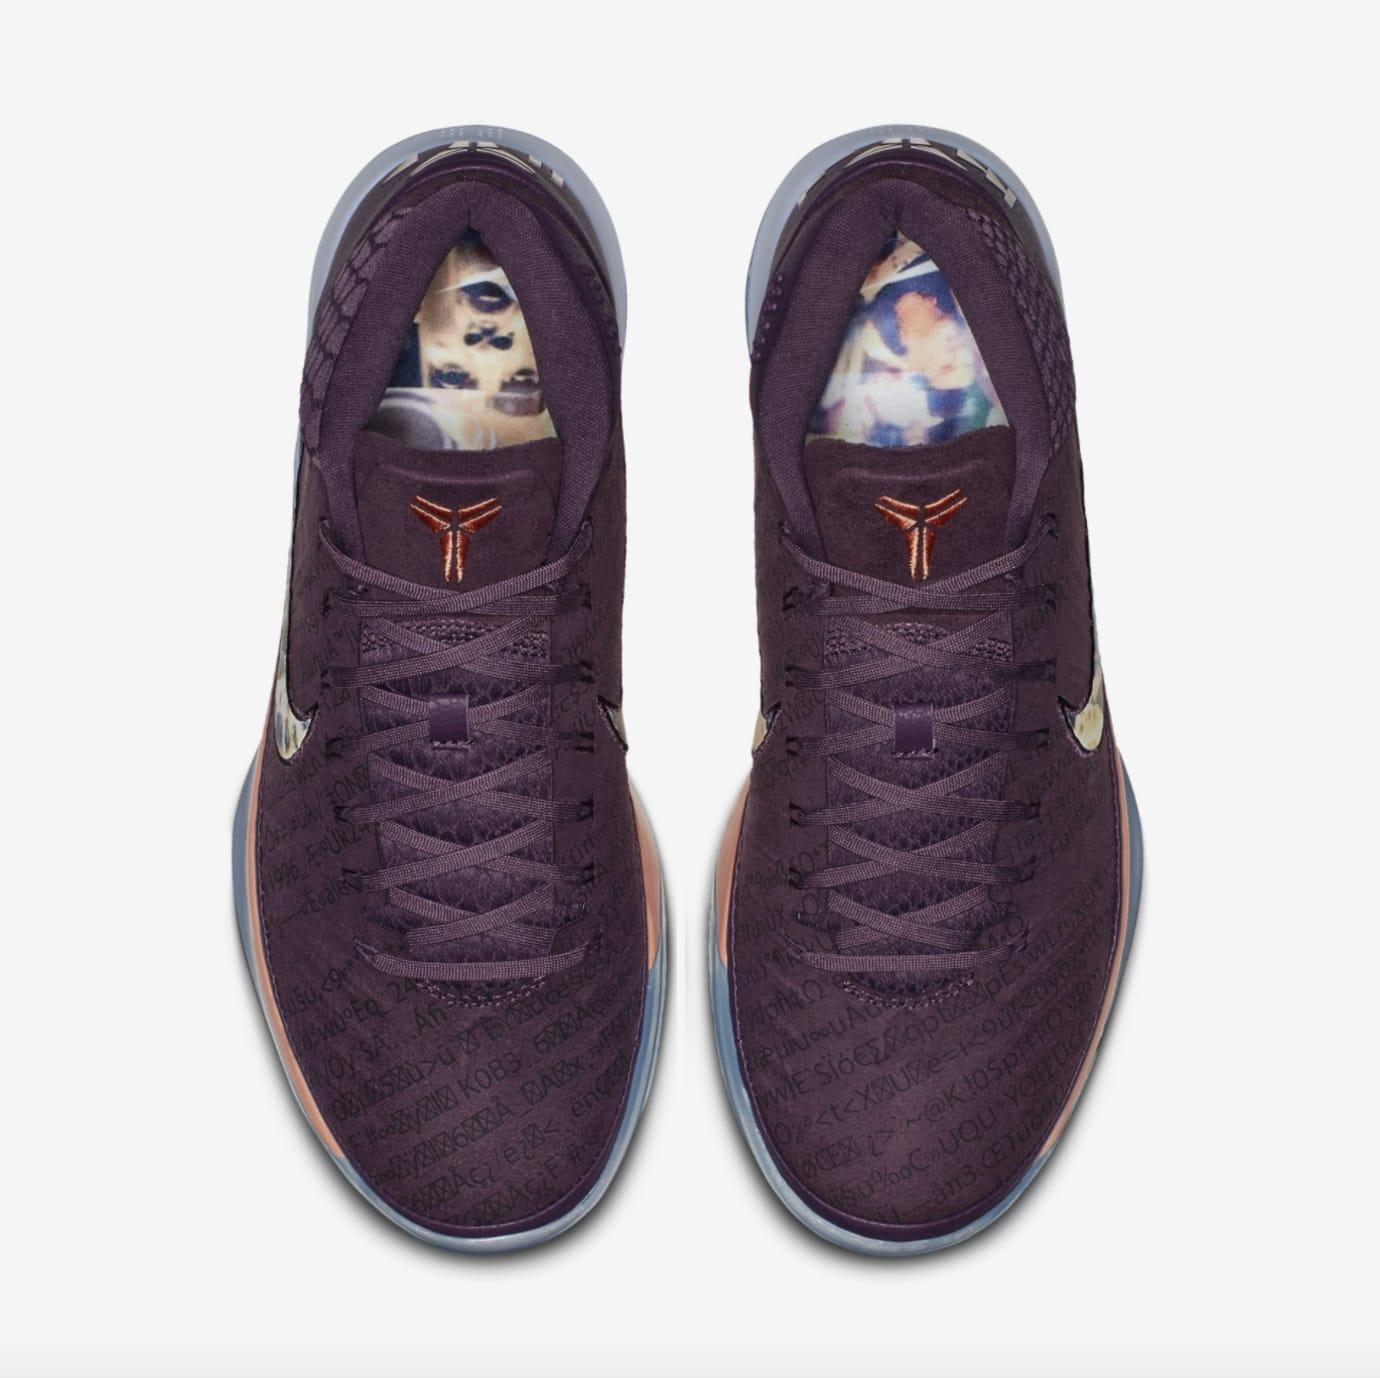 online store c2c82 ca592 Nike Kobe A.D. Mid 'Devin Booker PE' Release Date | Sole ...